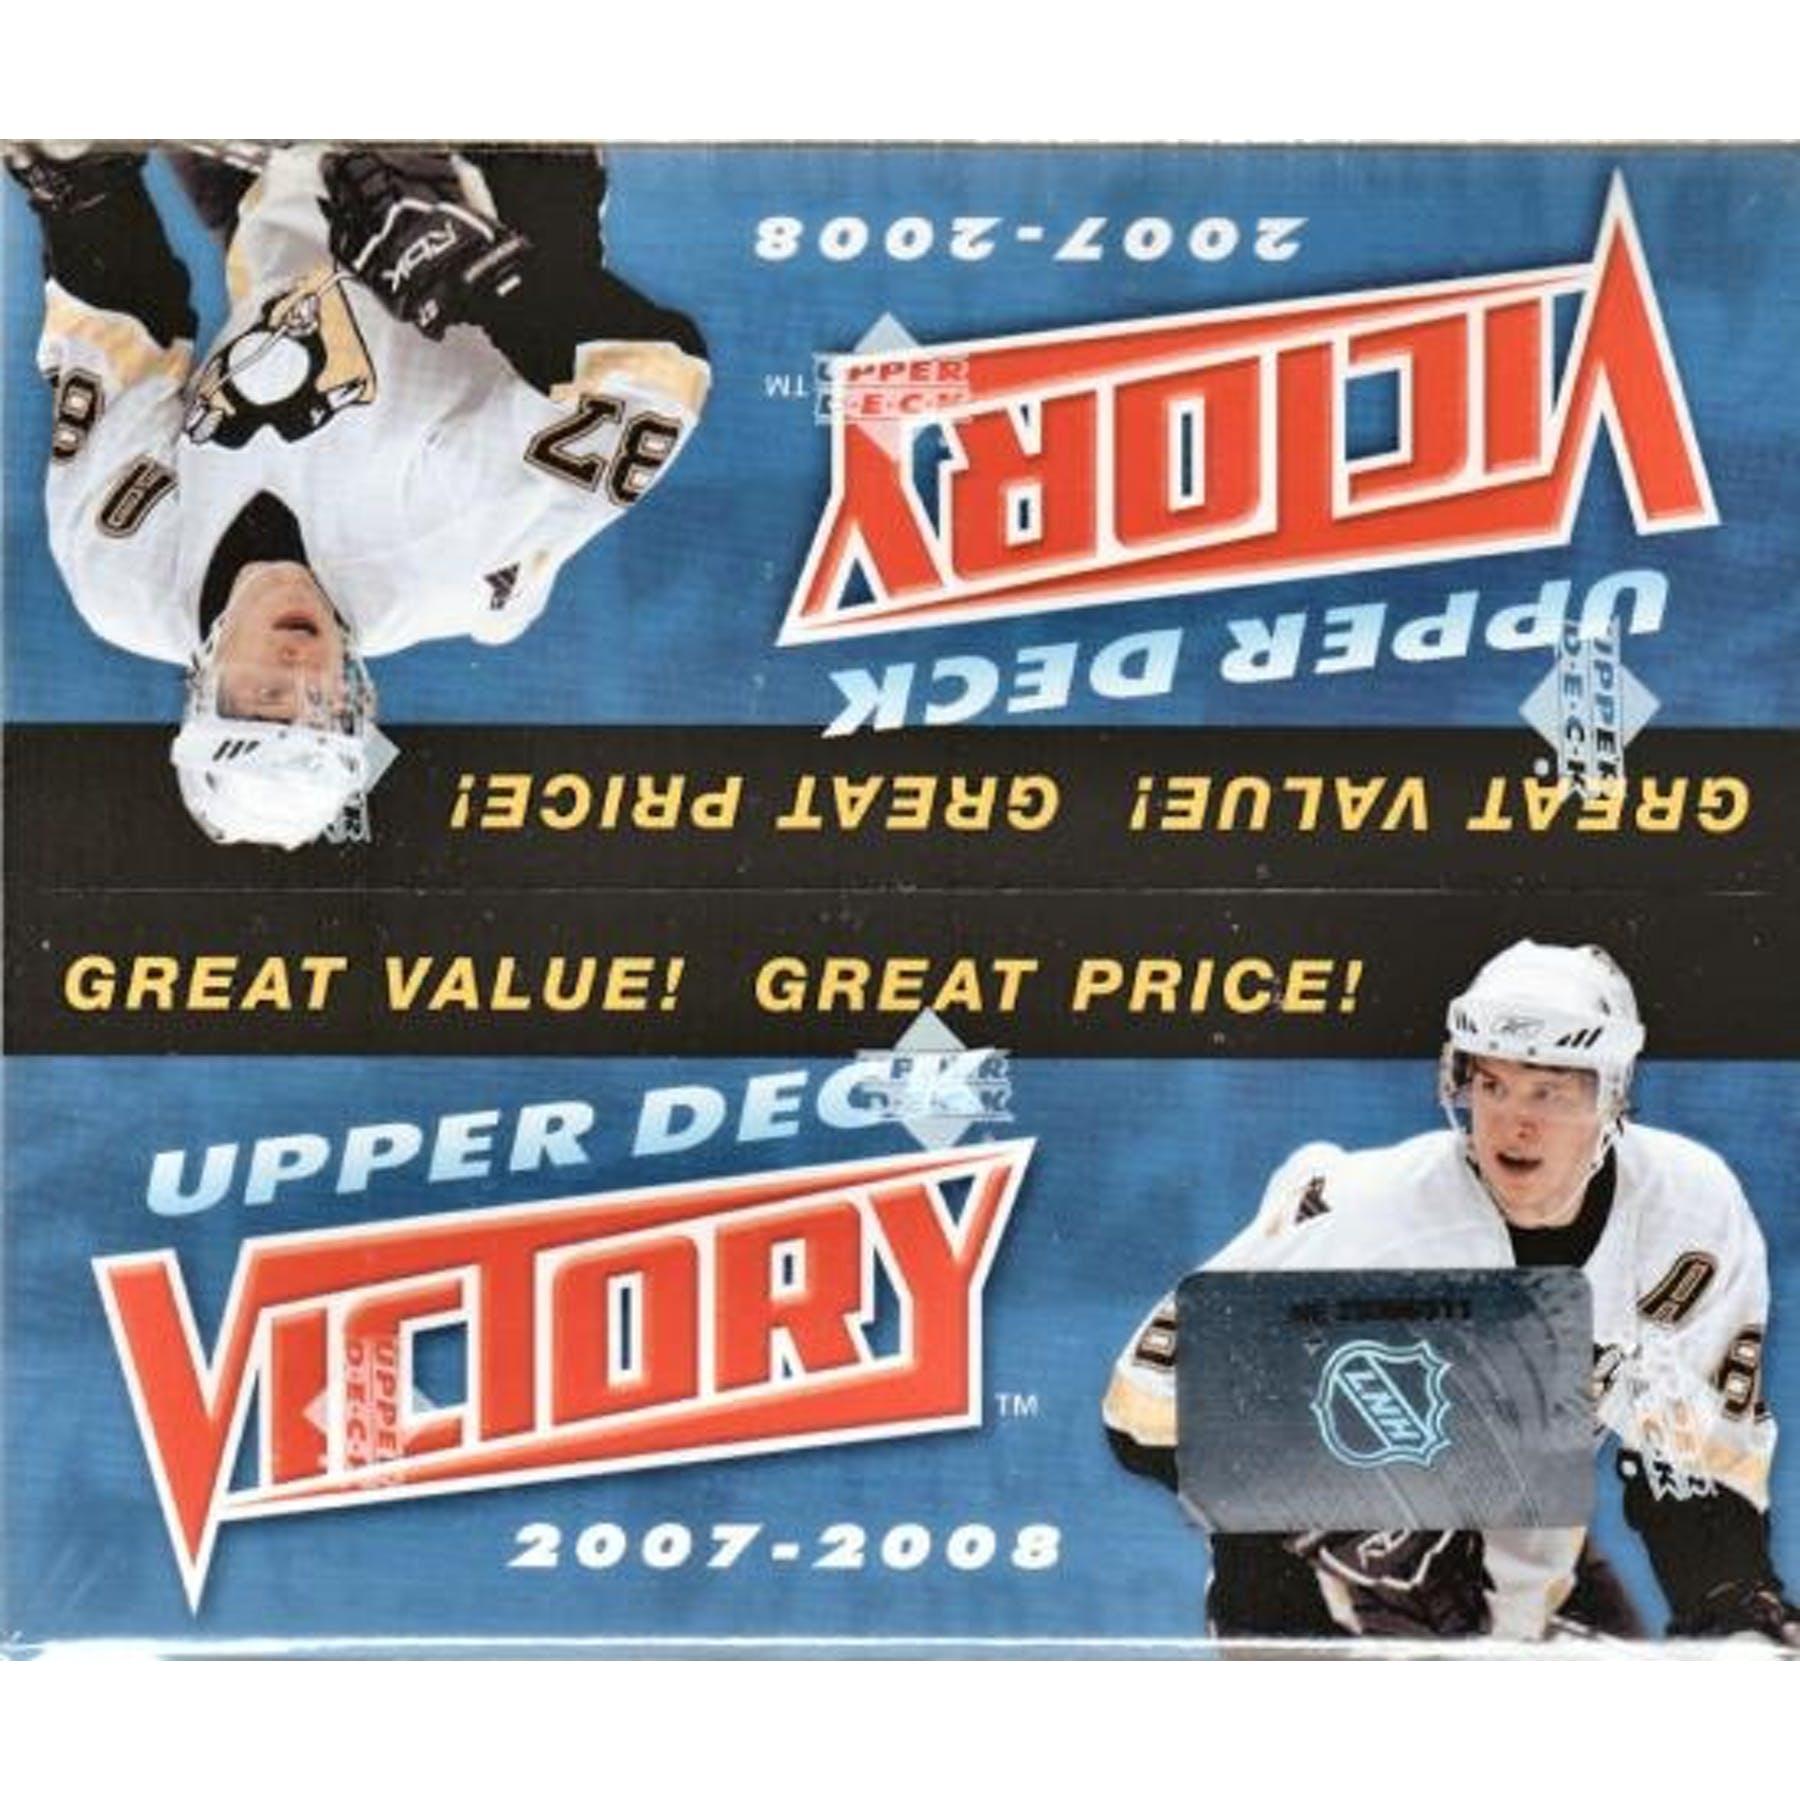 Upper Deck 2007-08 Victory Box